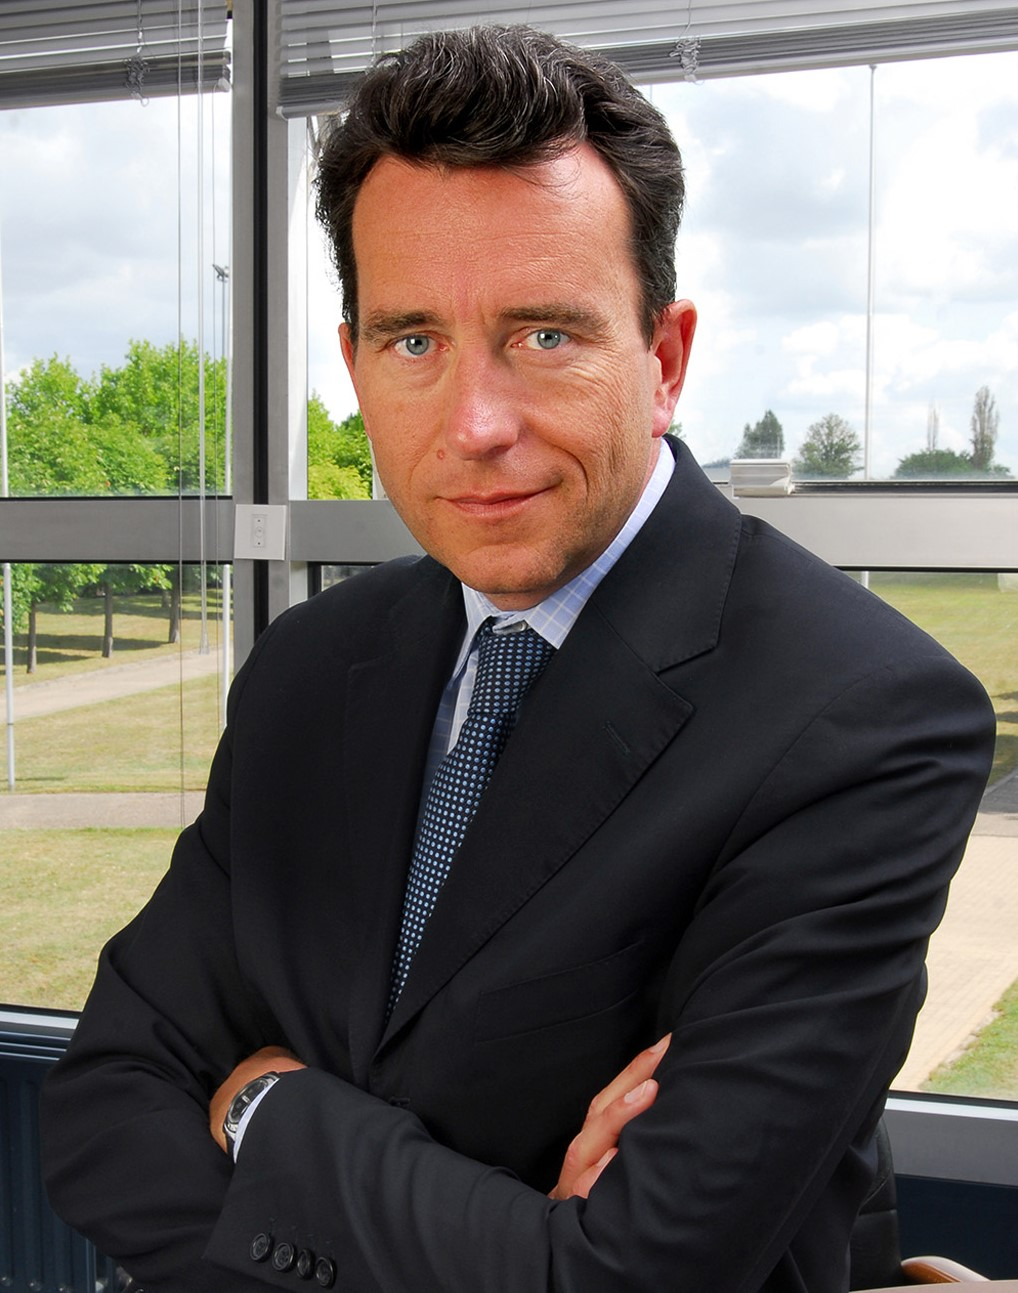 Christophe Delahousse